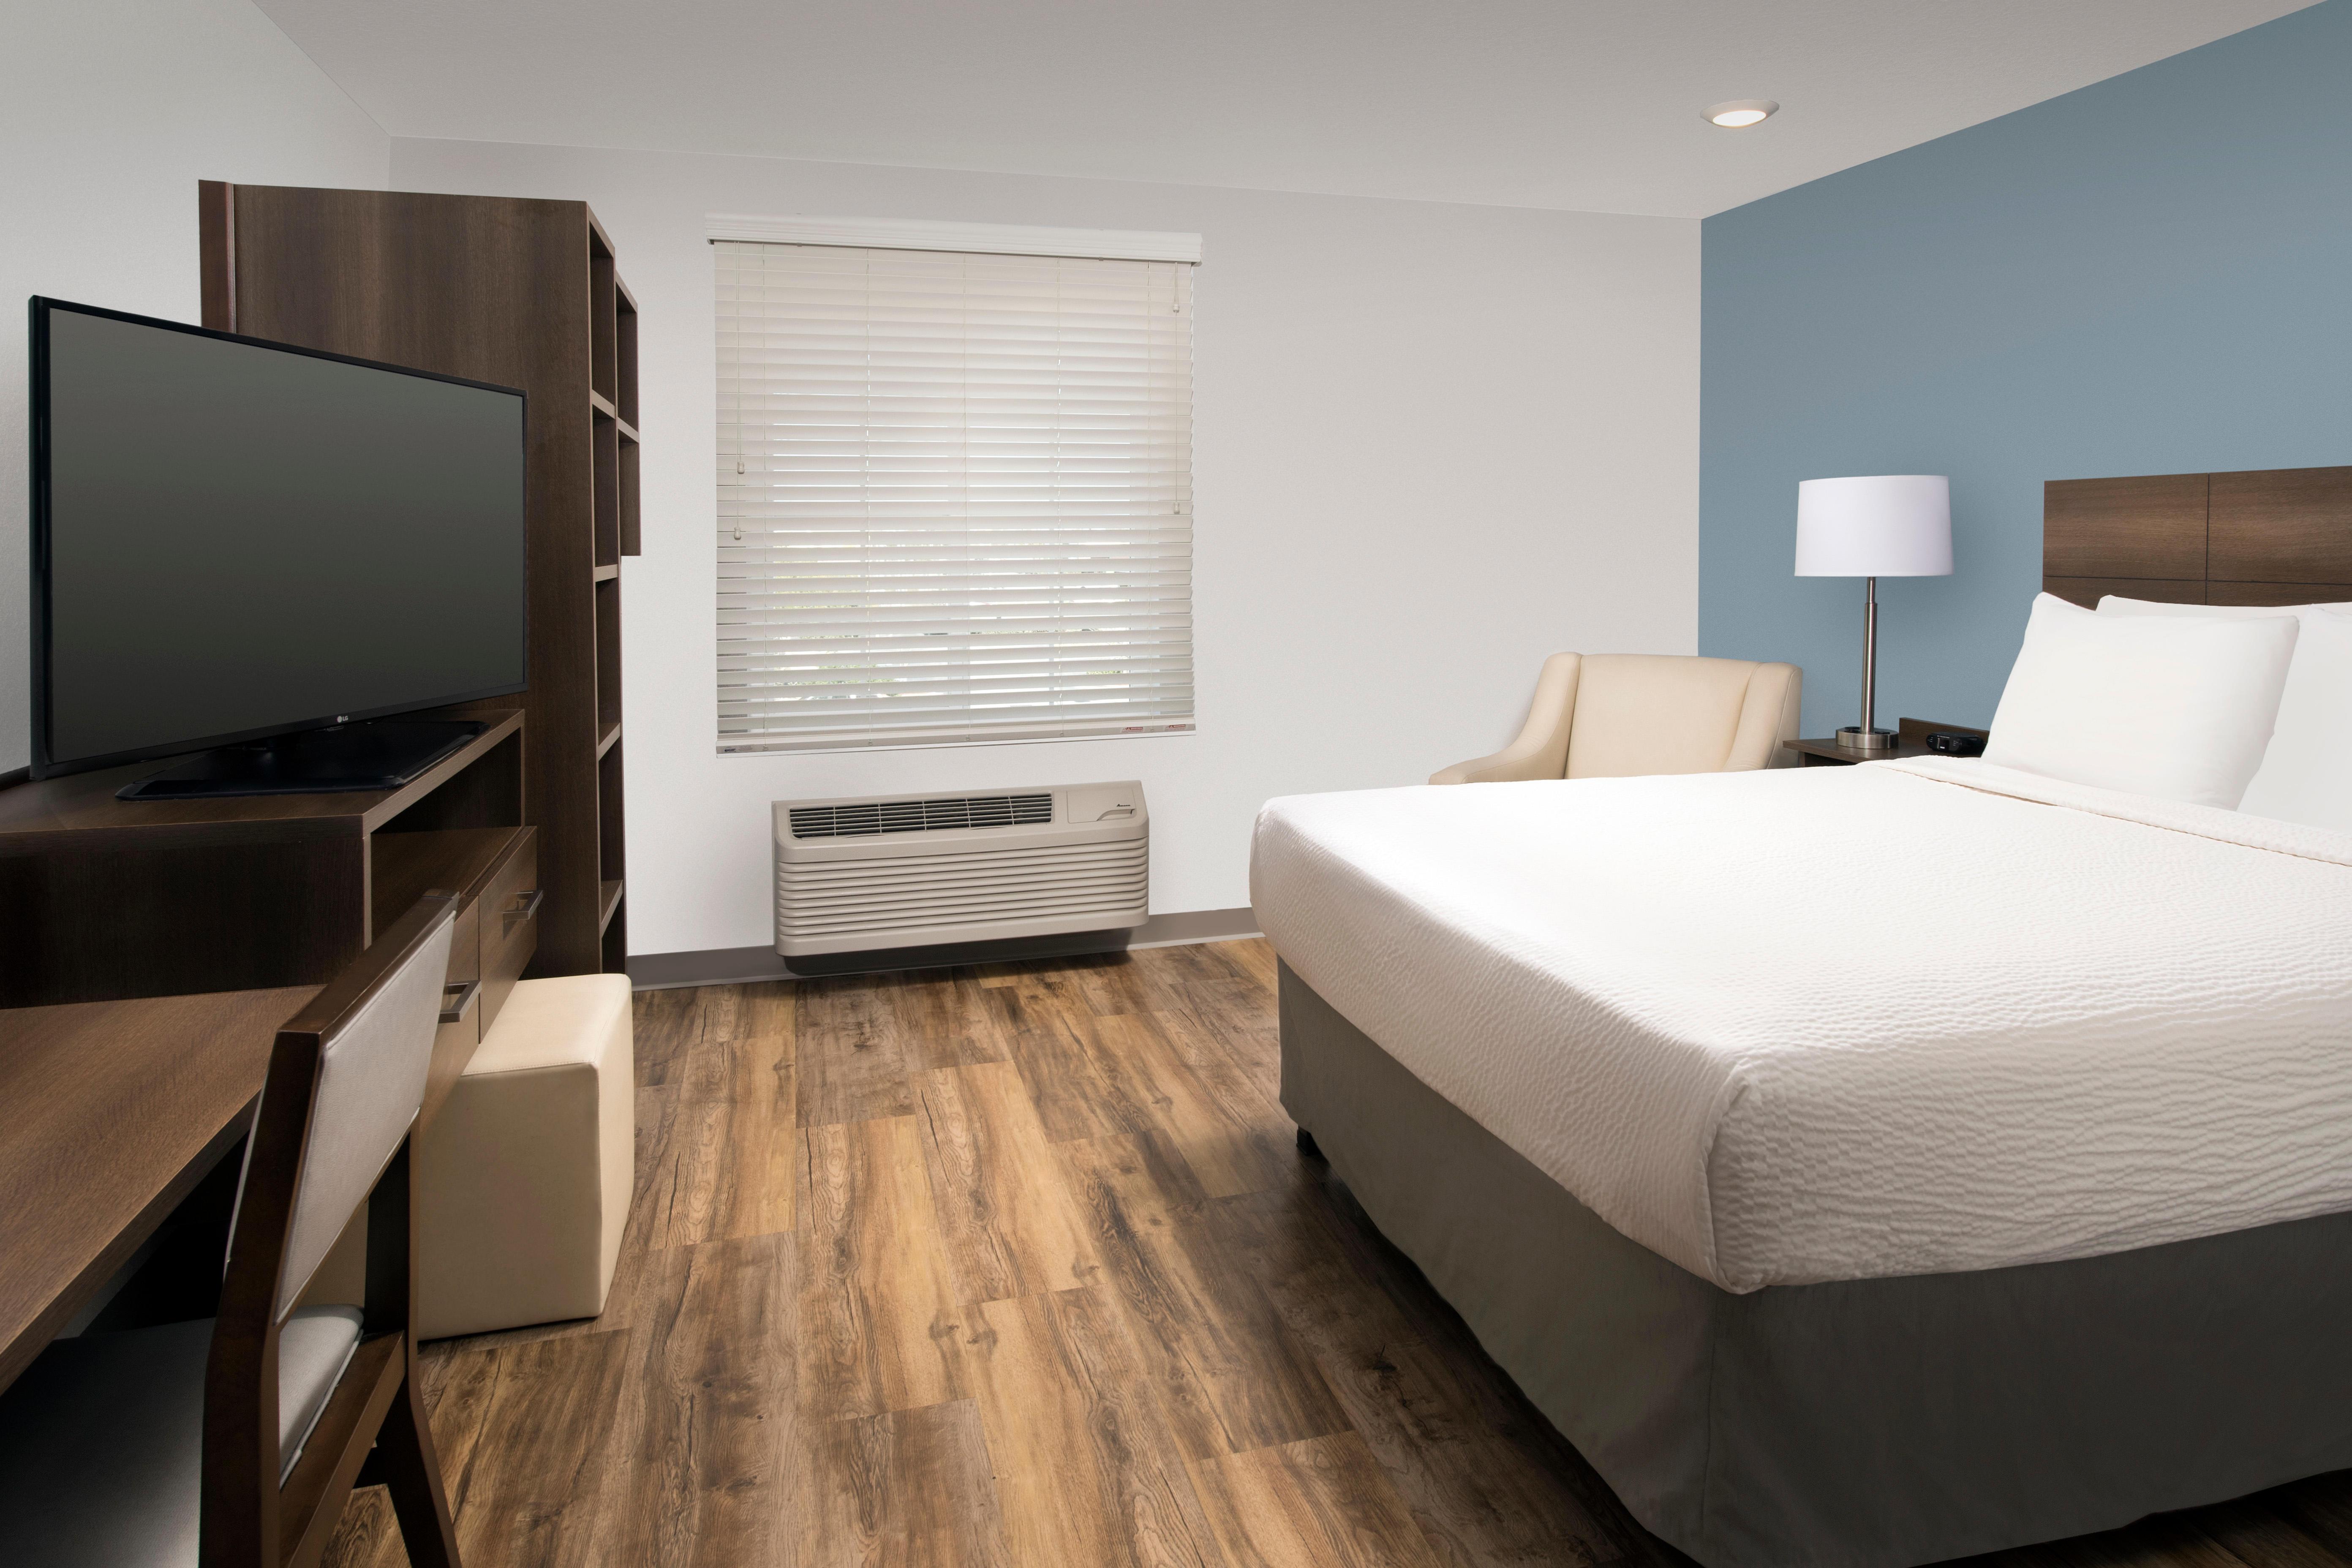 WoodSpring Suites Clearwater image 14